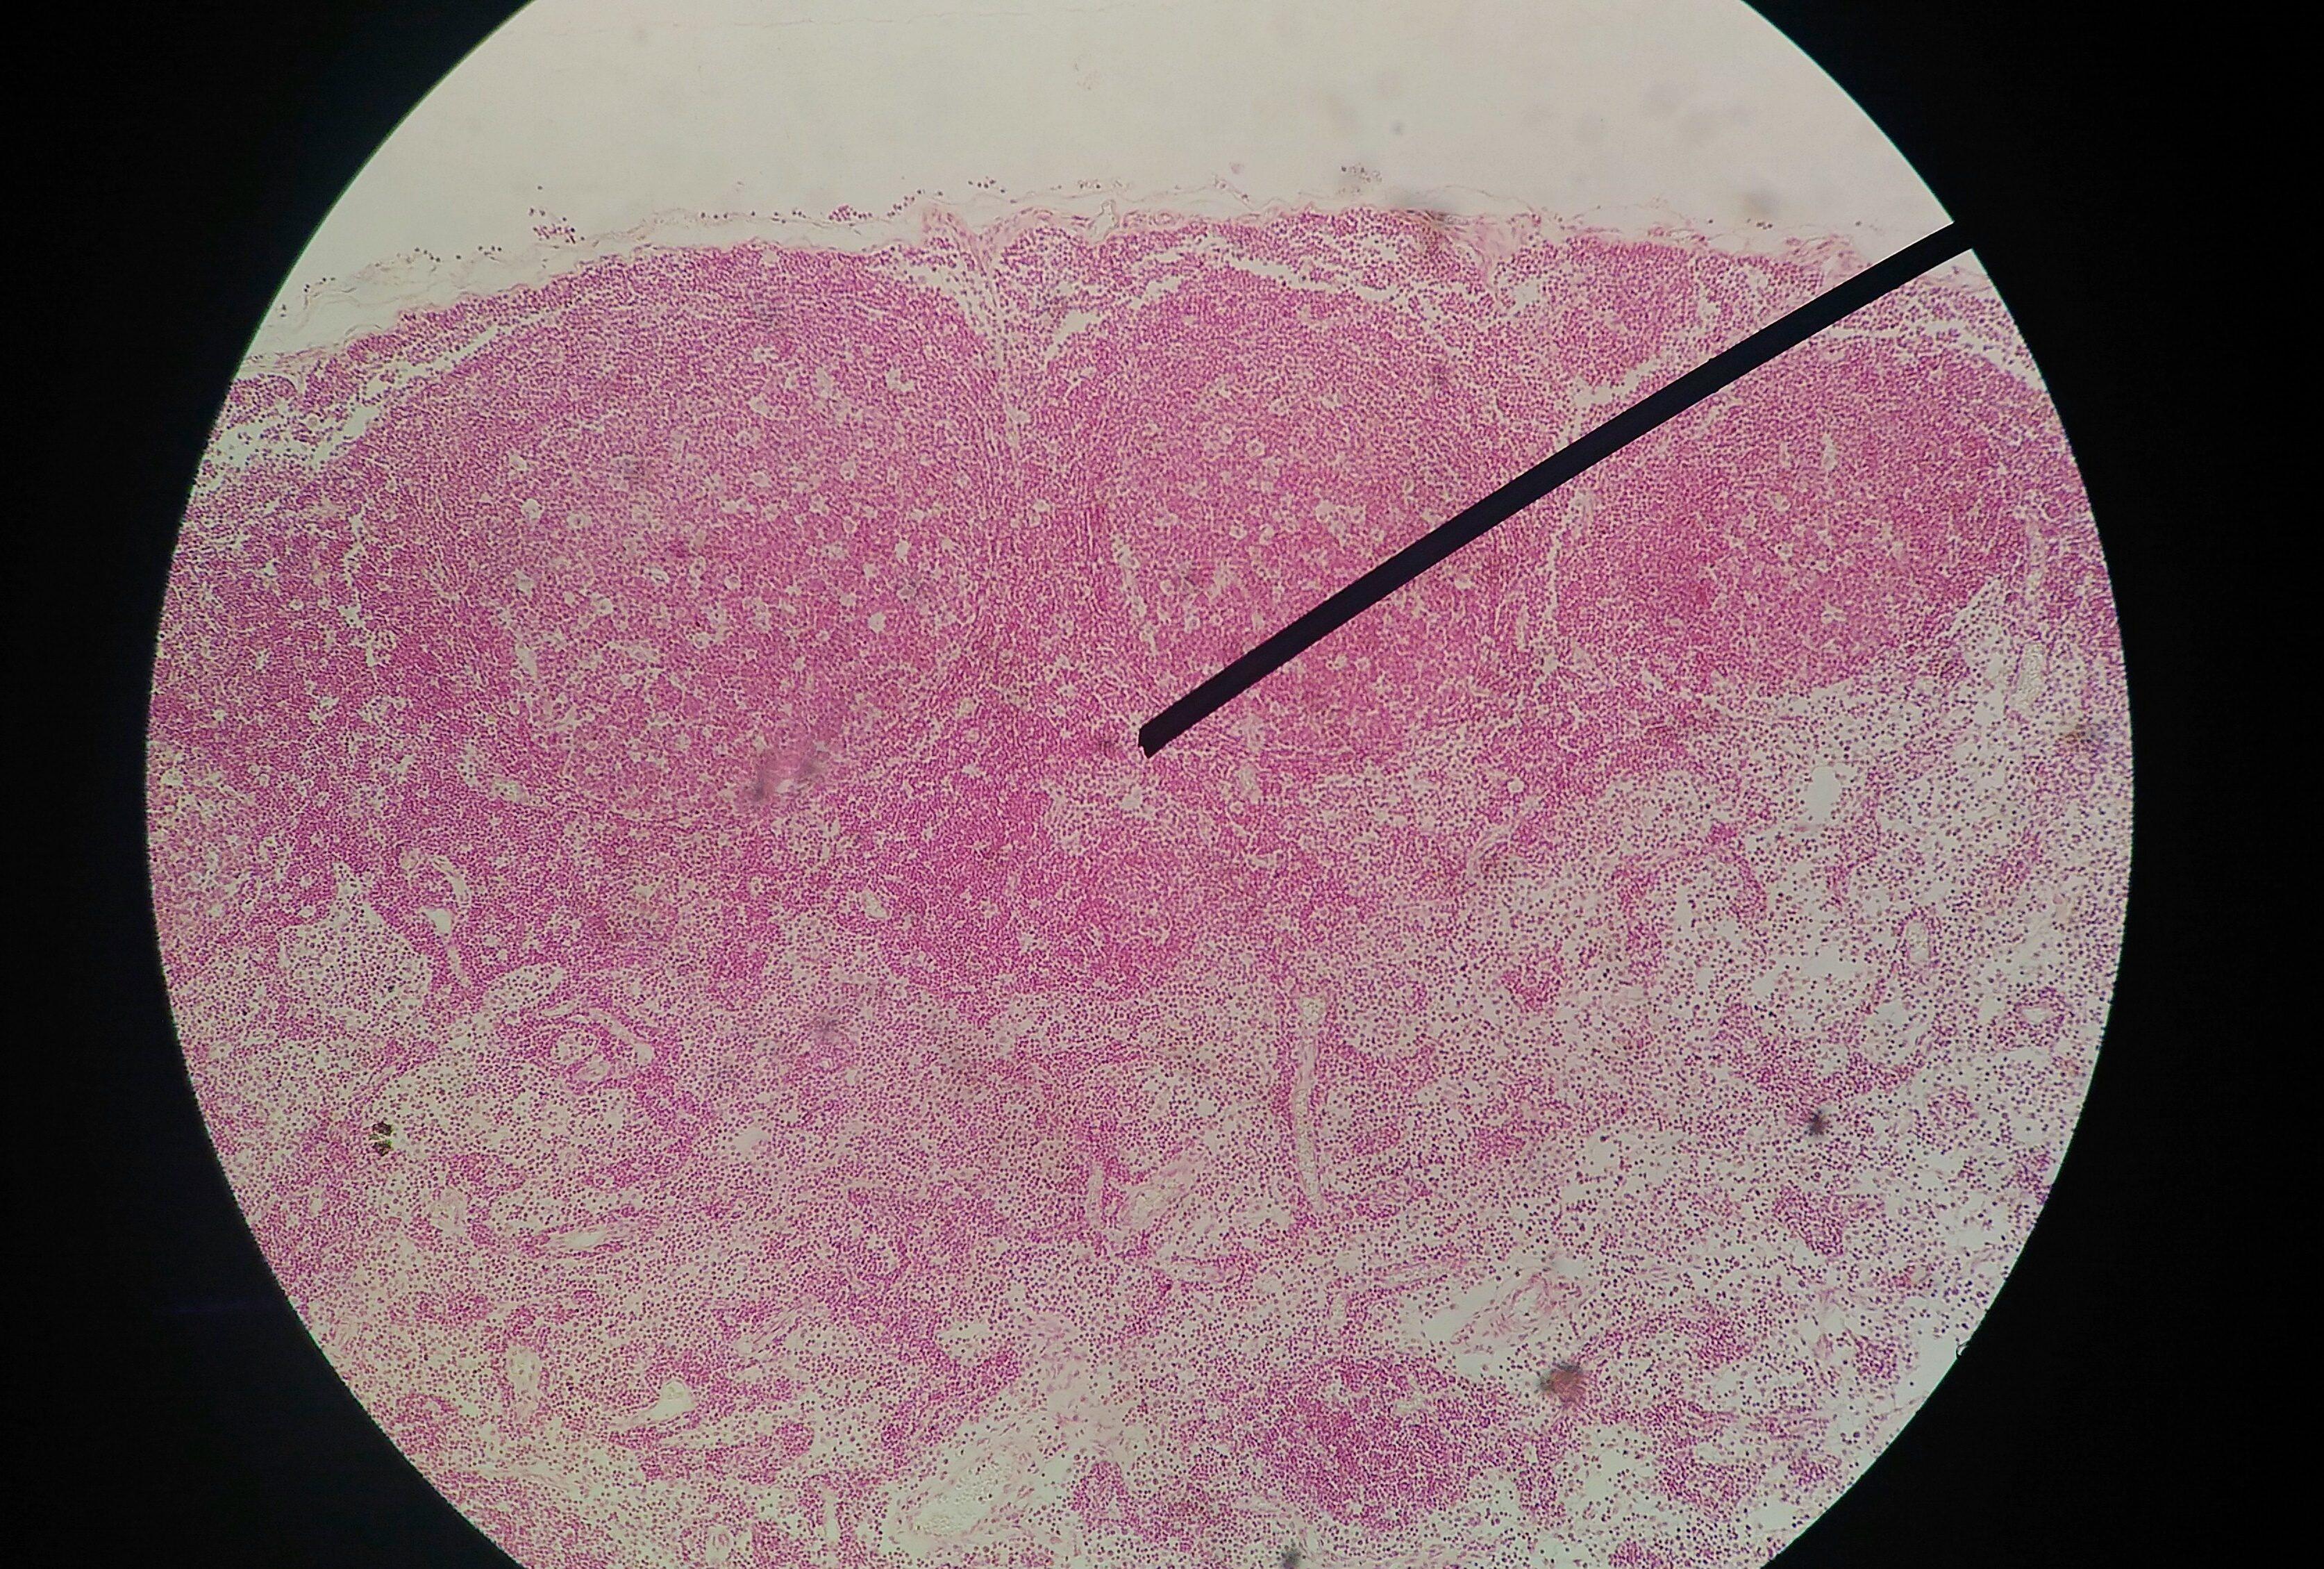 urine e papilloma virus